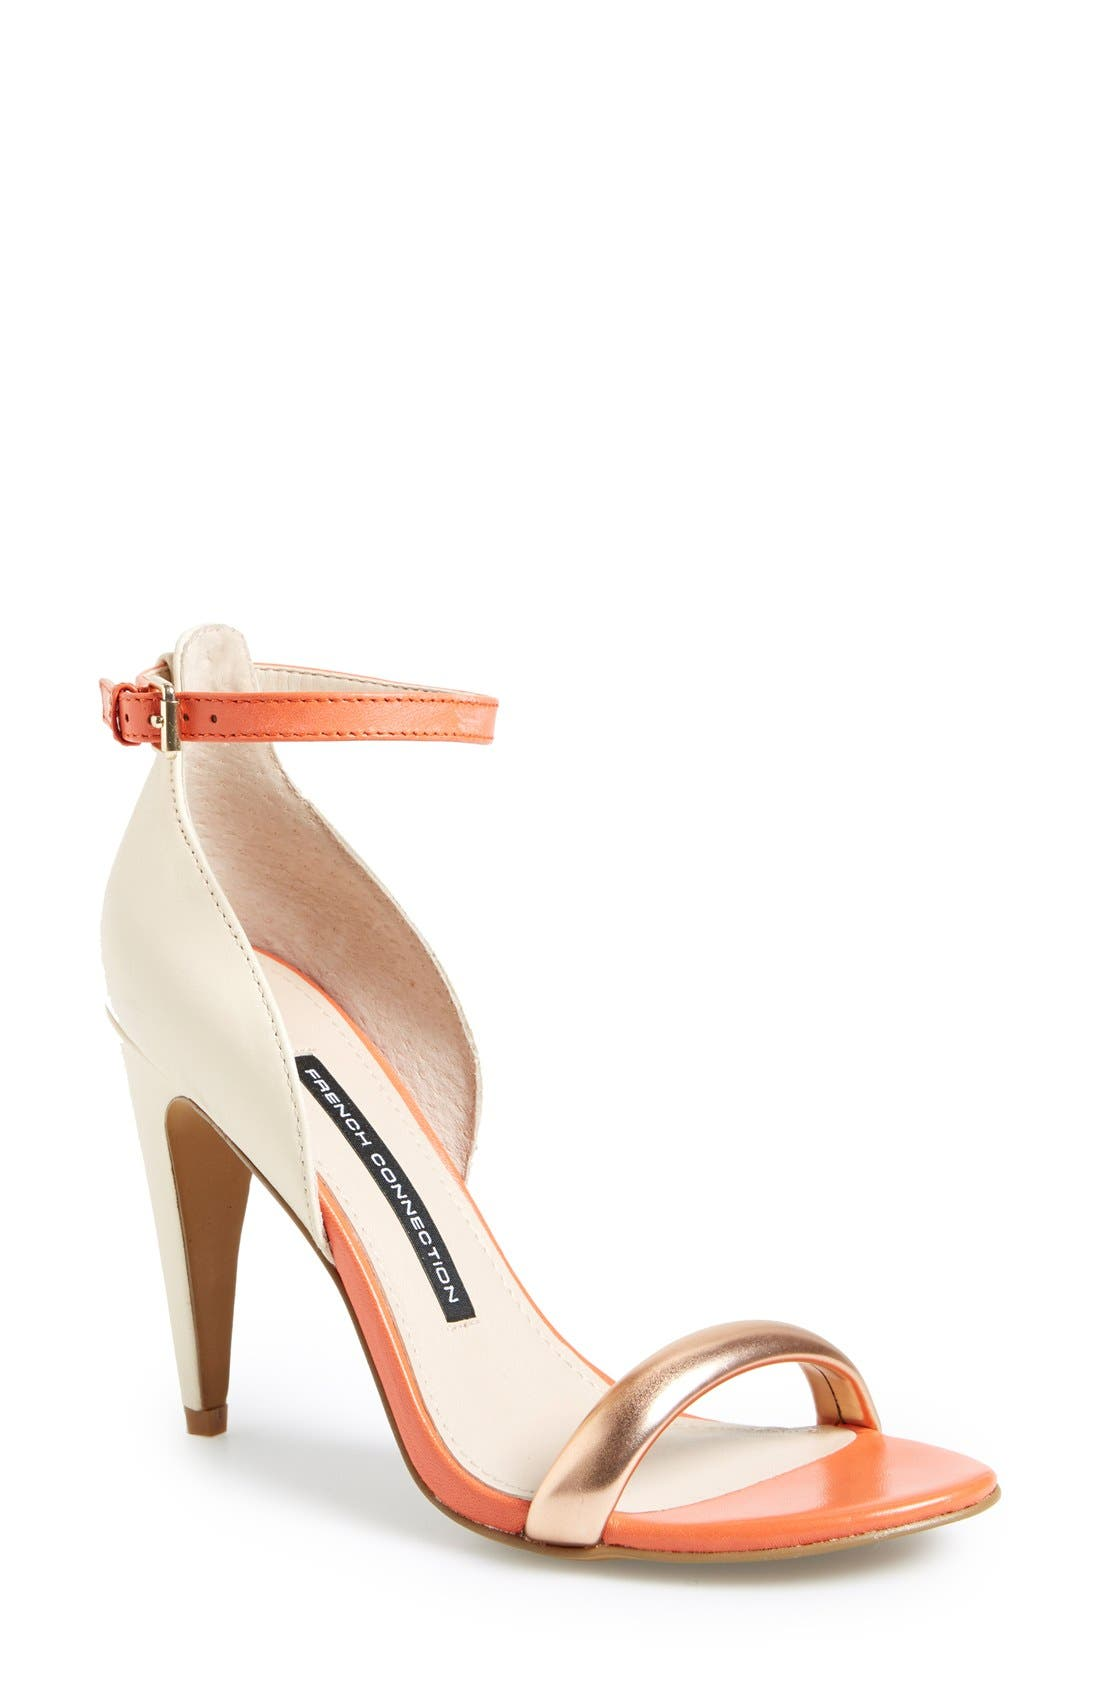 Main Image - French Connection 'Nanette' Ankle Strap Sandal (Women)